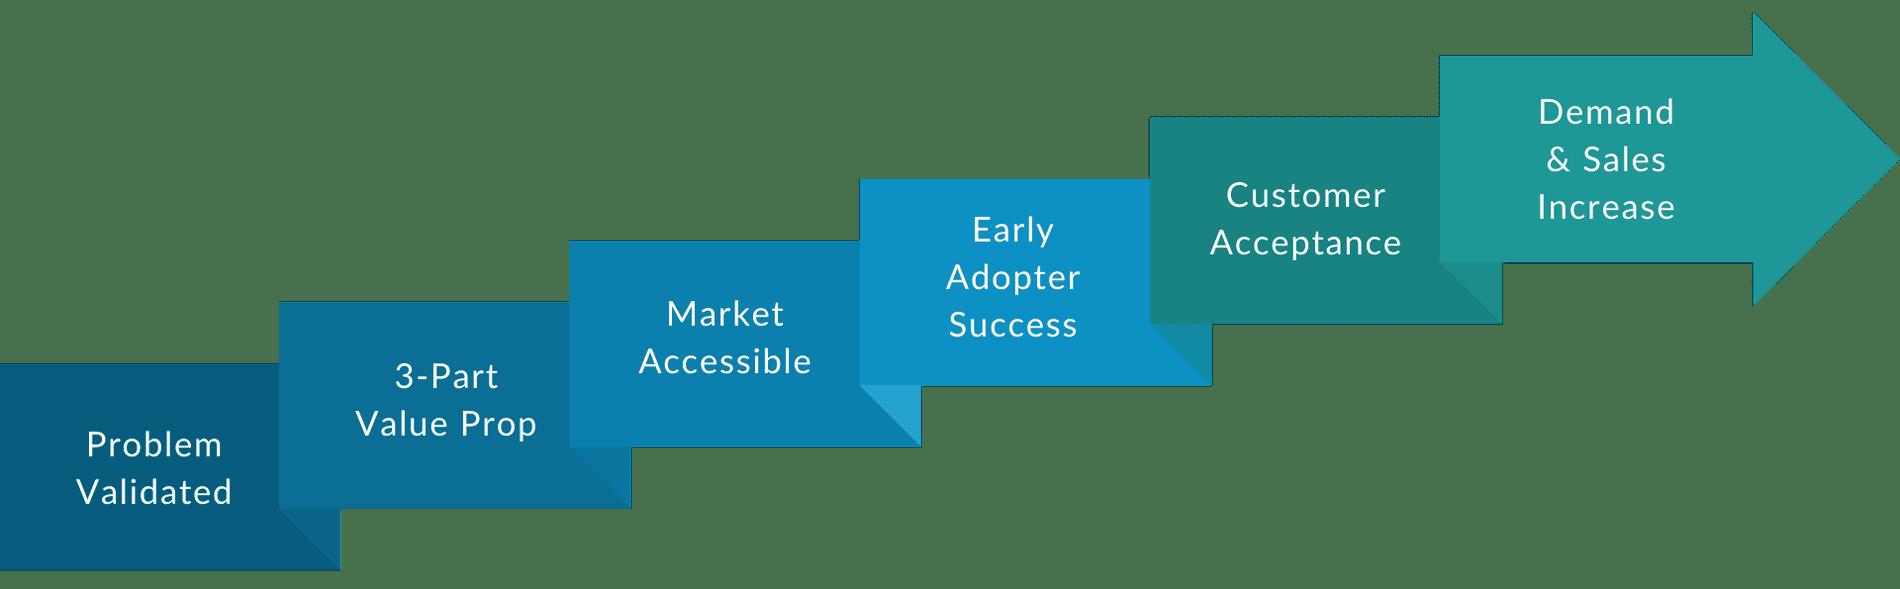 Green Room Technologies | Market Readiness Process